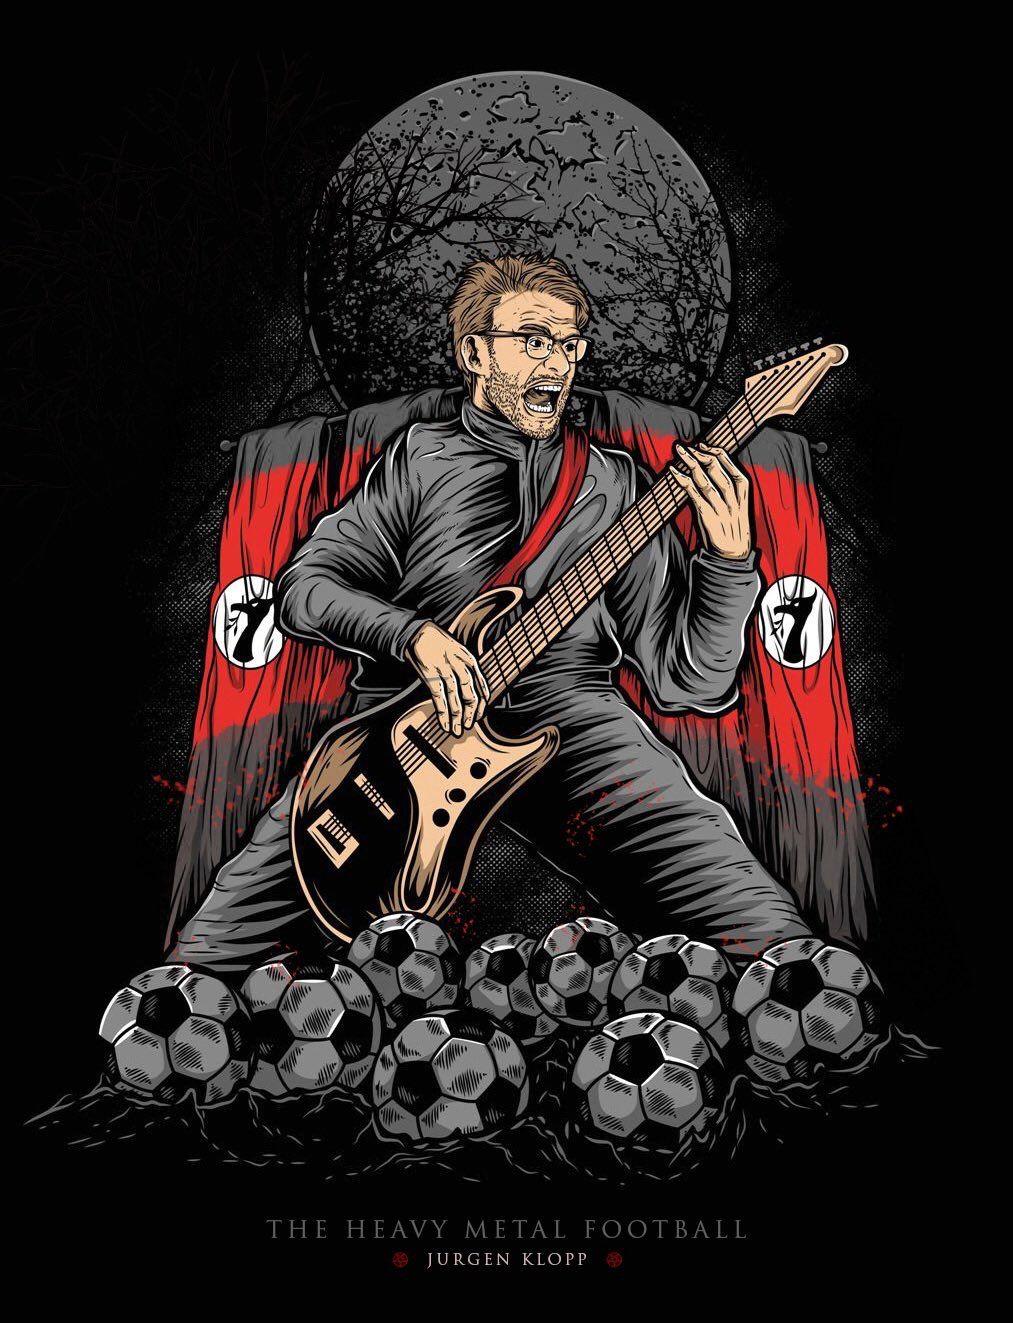 Heavy Metal Football ⚽ ❤️